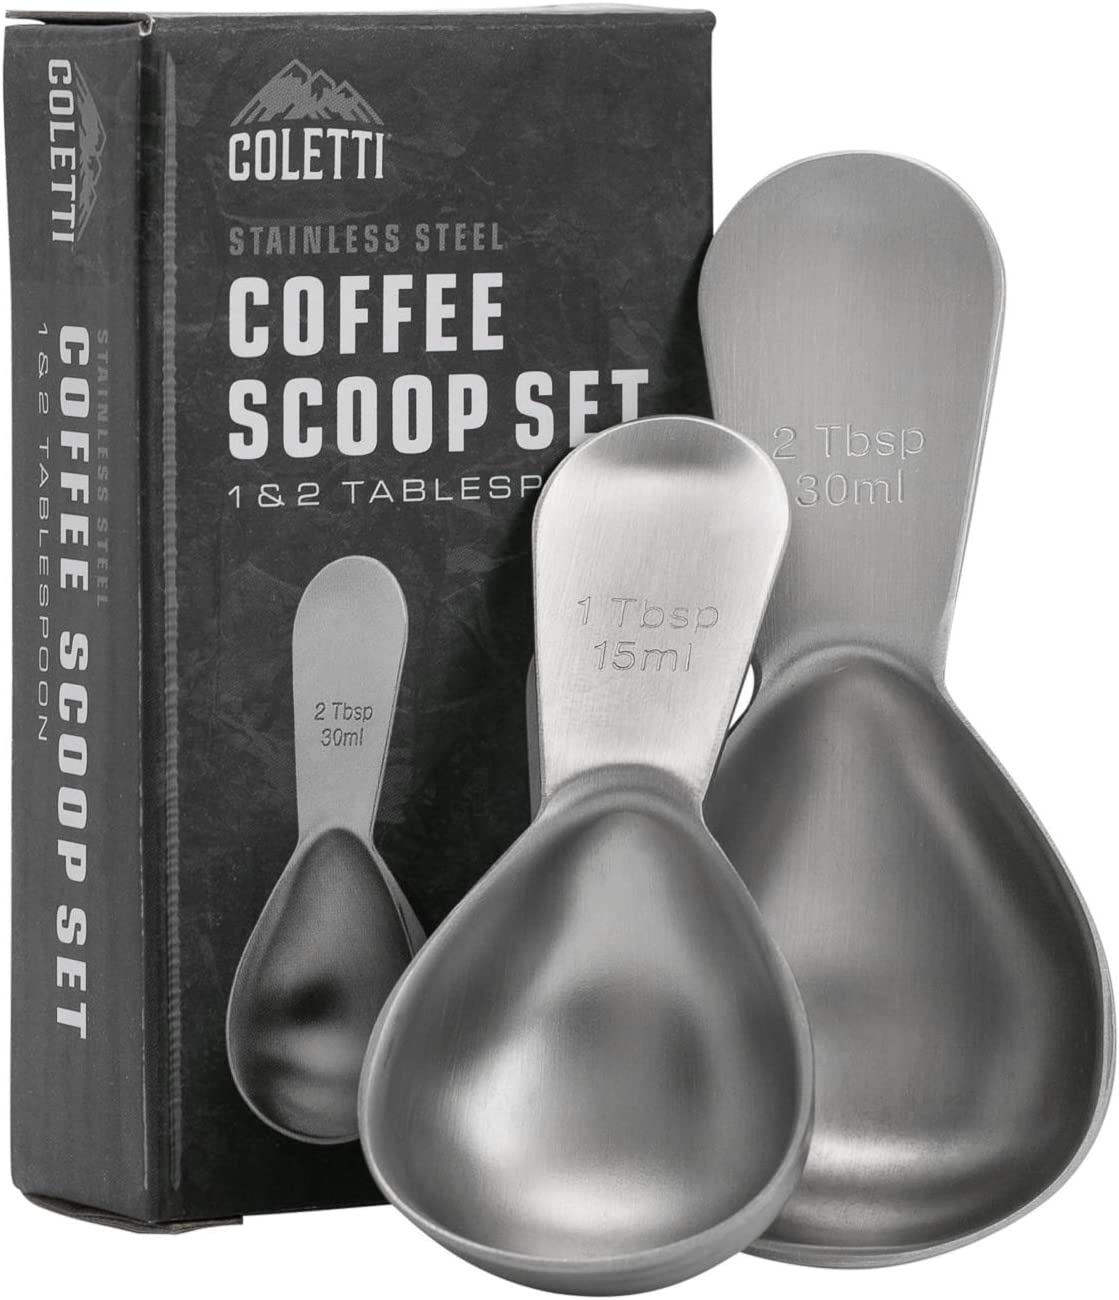 COLETTI Coffee Scoop | Coffee Measuring Scoop Set | Small Coffee Scooper